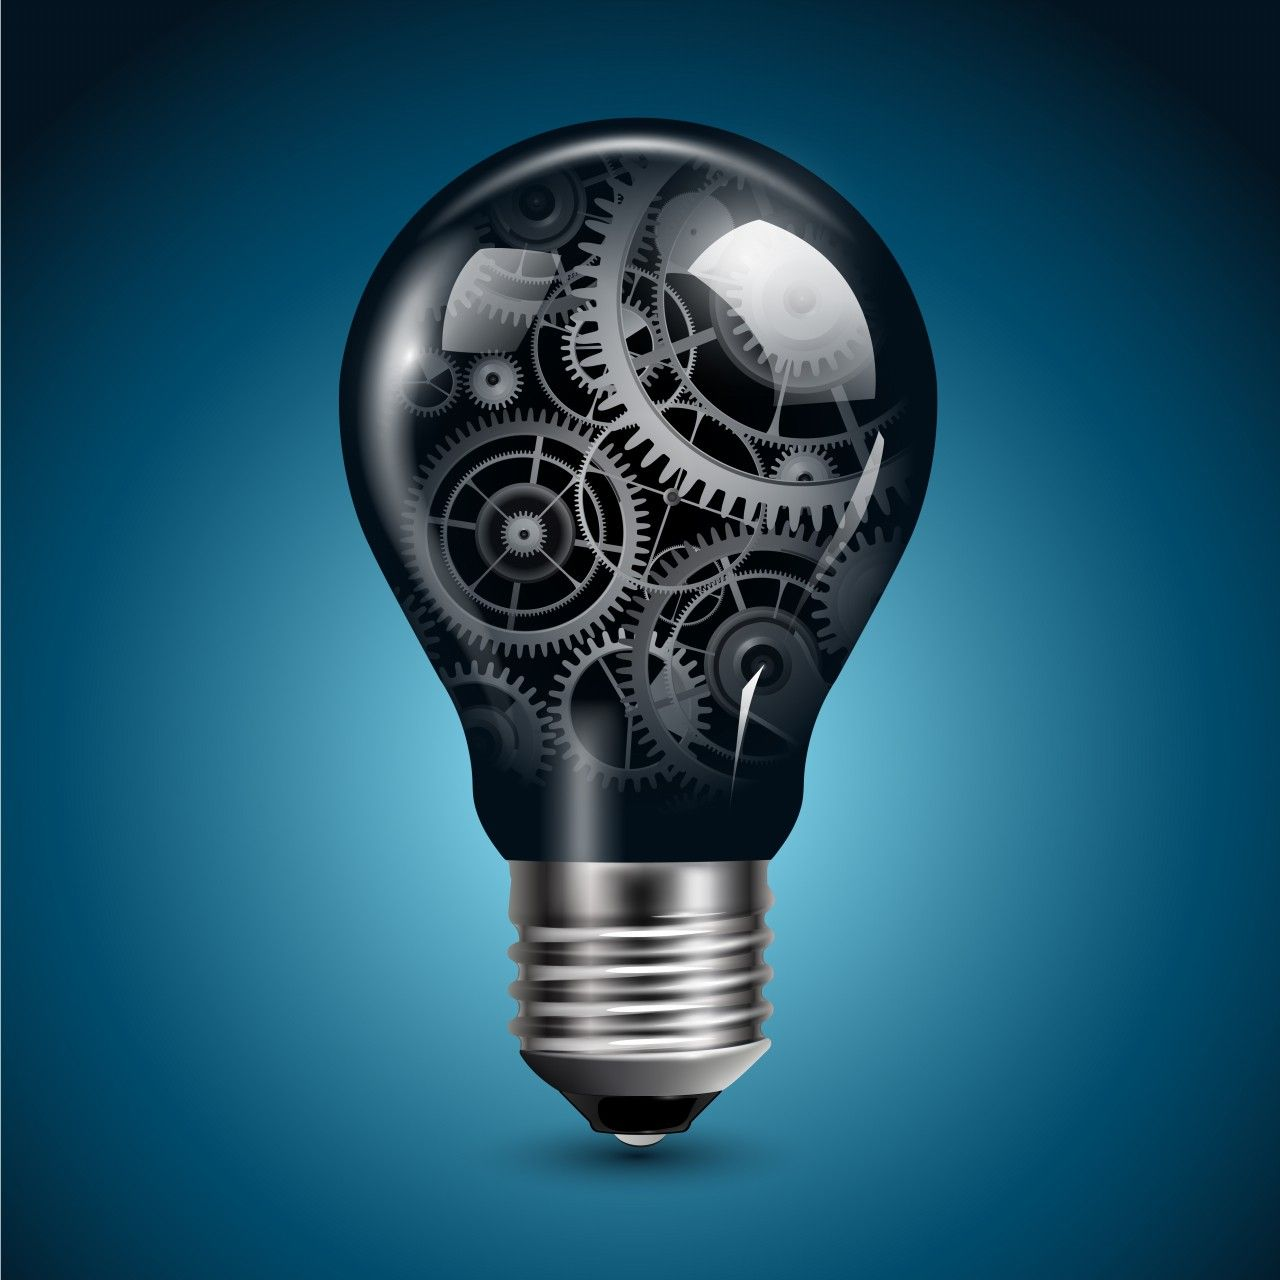 Wallpapers Digital Lightbulb Light Bulb With Gears